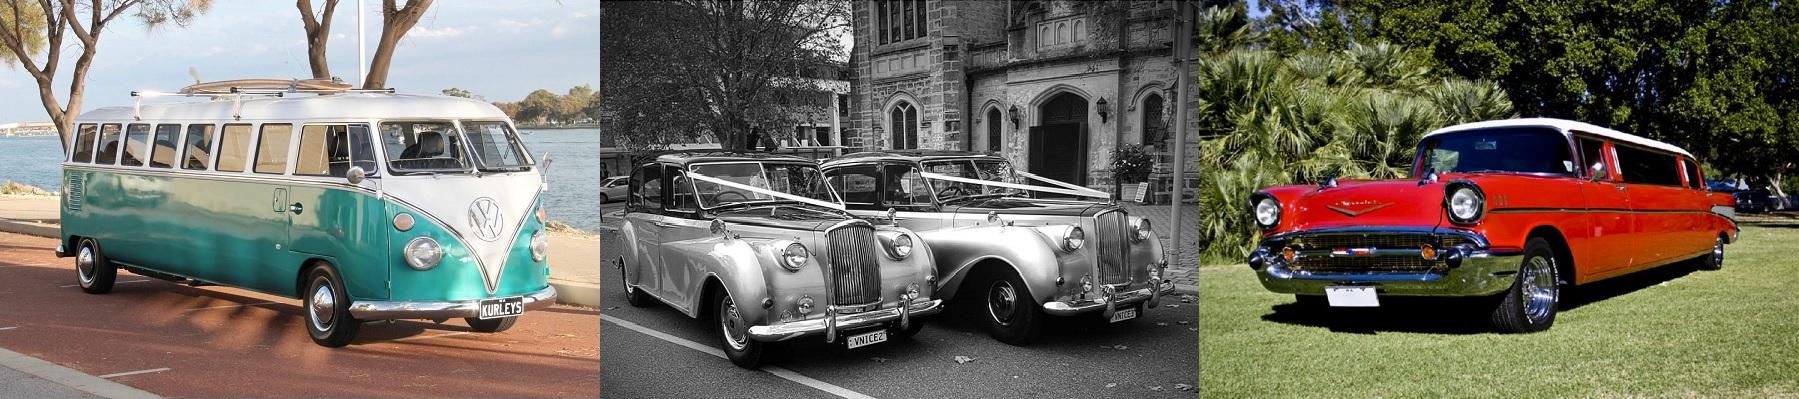 Limousines & Classics - Perth Vintage & Classic Car Hire